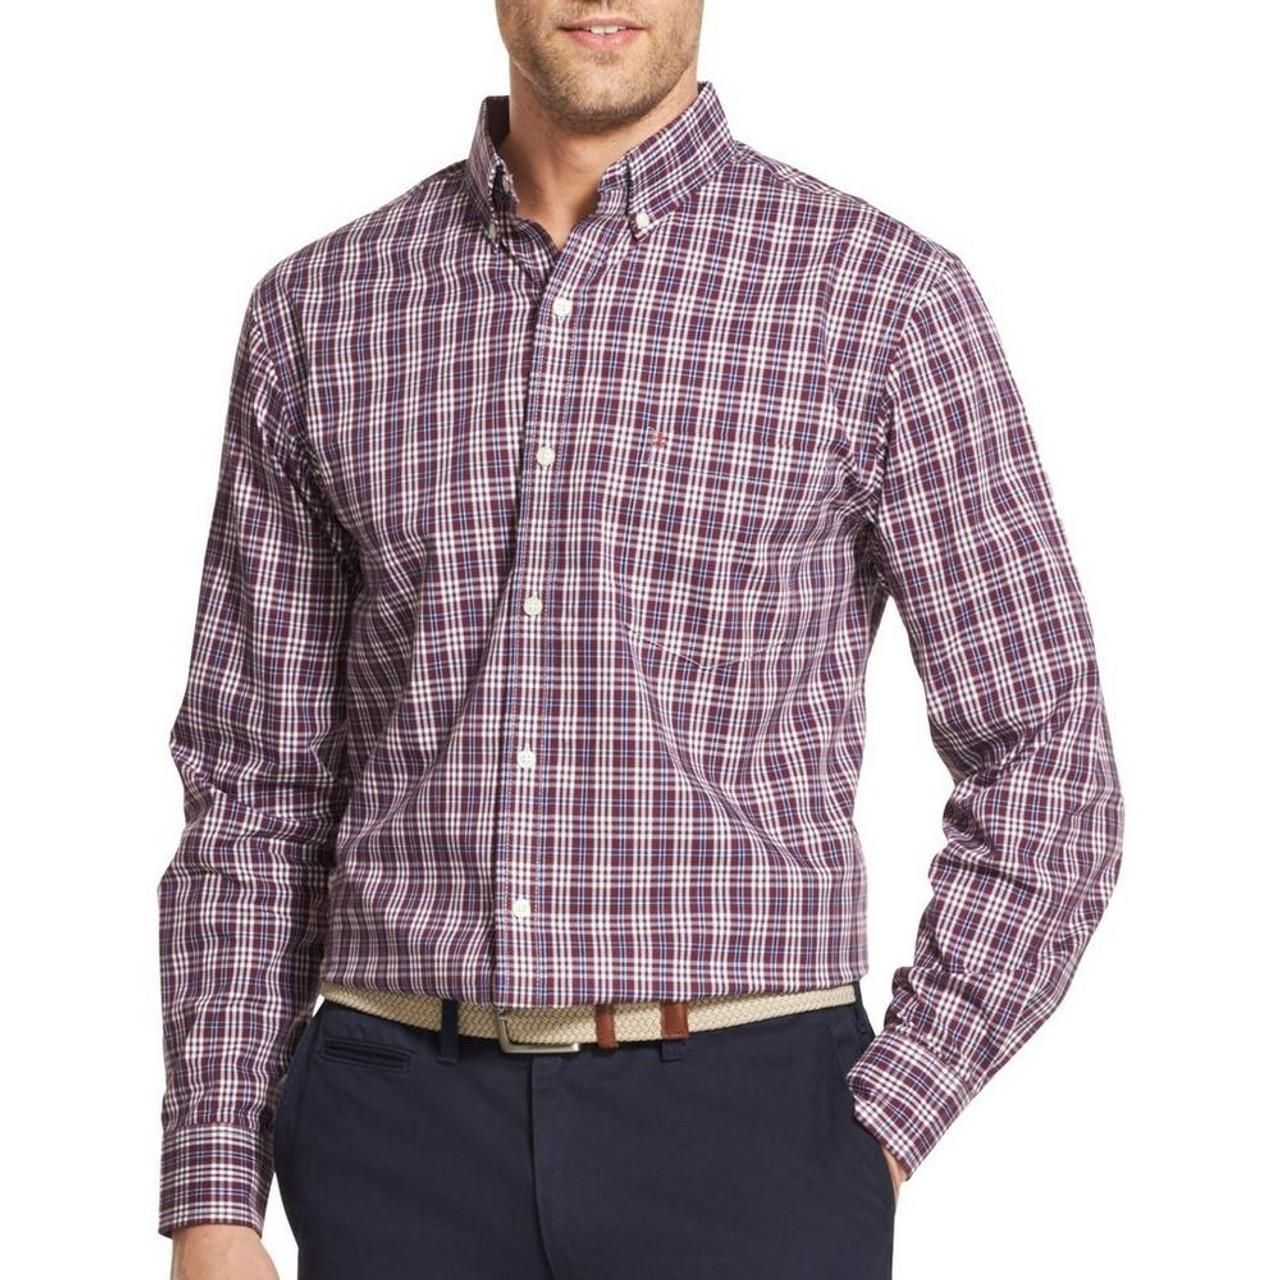 9b10d104861 IZOD Mens Premium Essentials Checkered Plaid Button Up Shirt~45GW004 ...